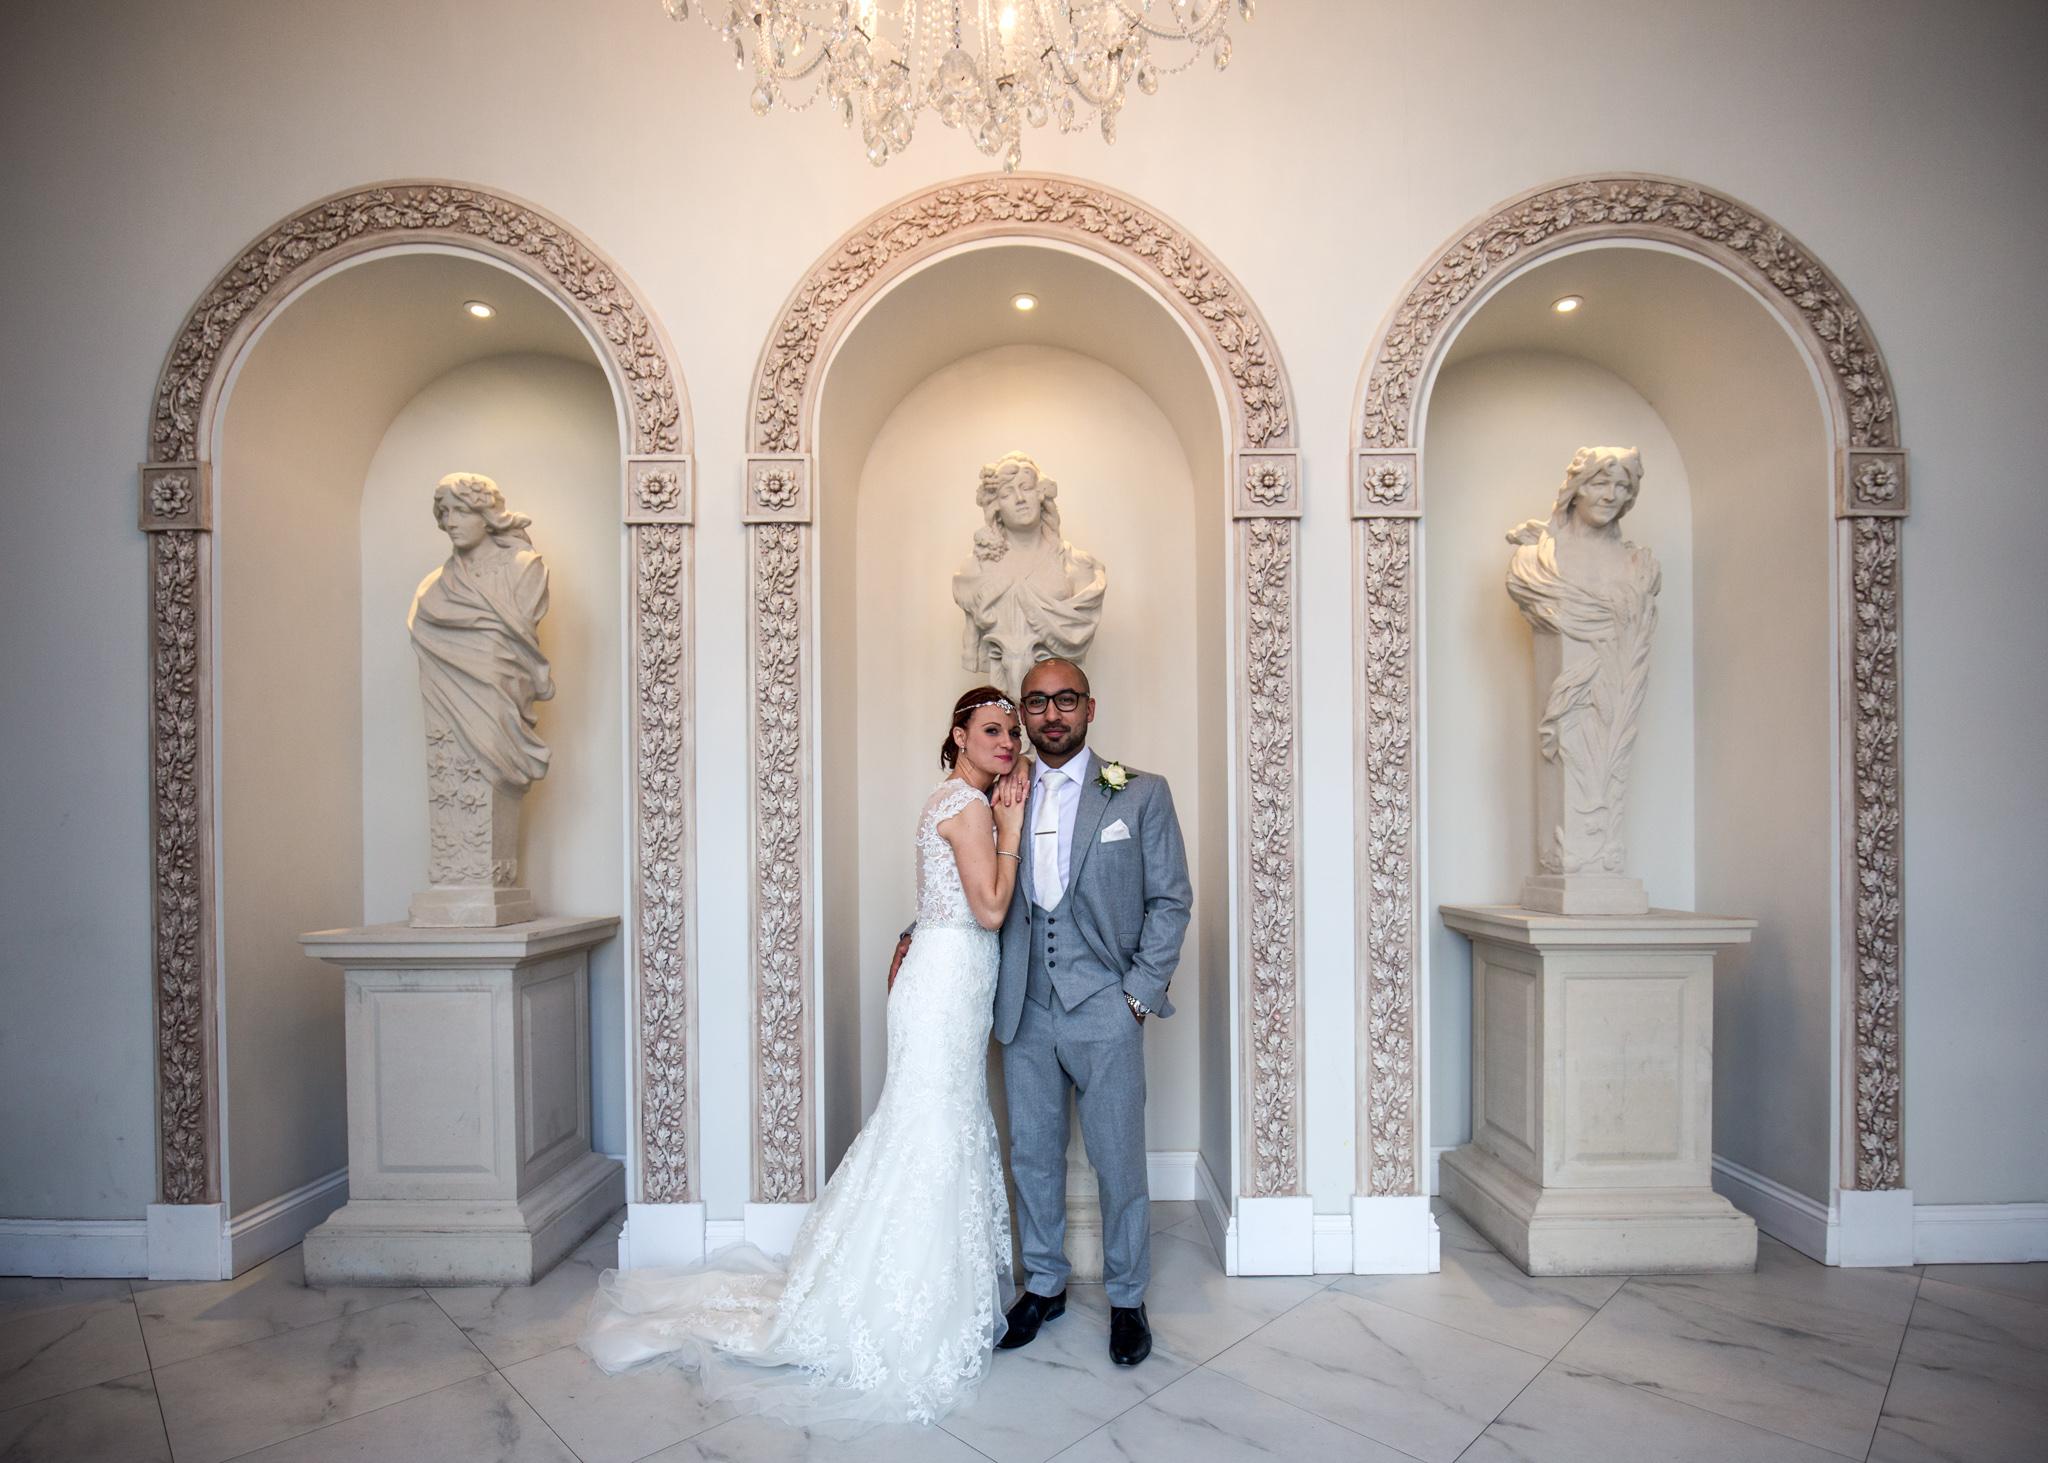 Froyle Park Wedding Photography - Emma & Sandeep